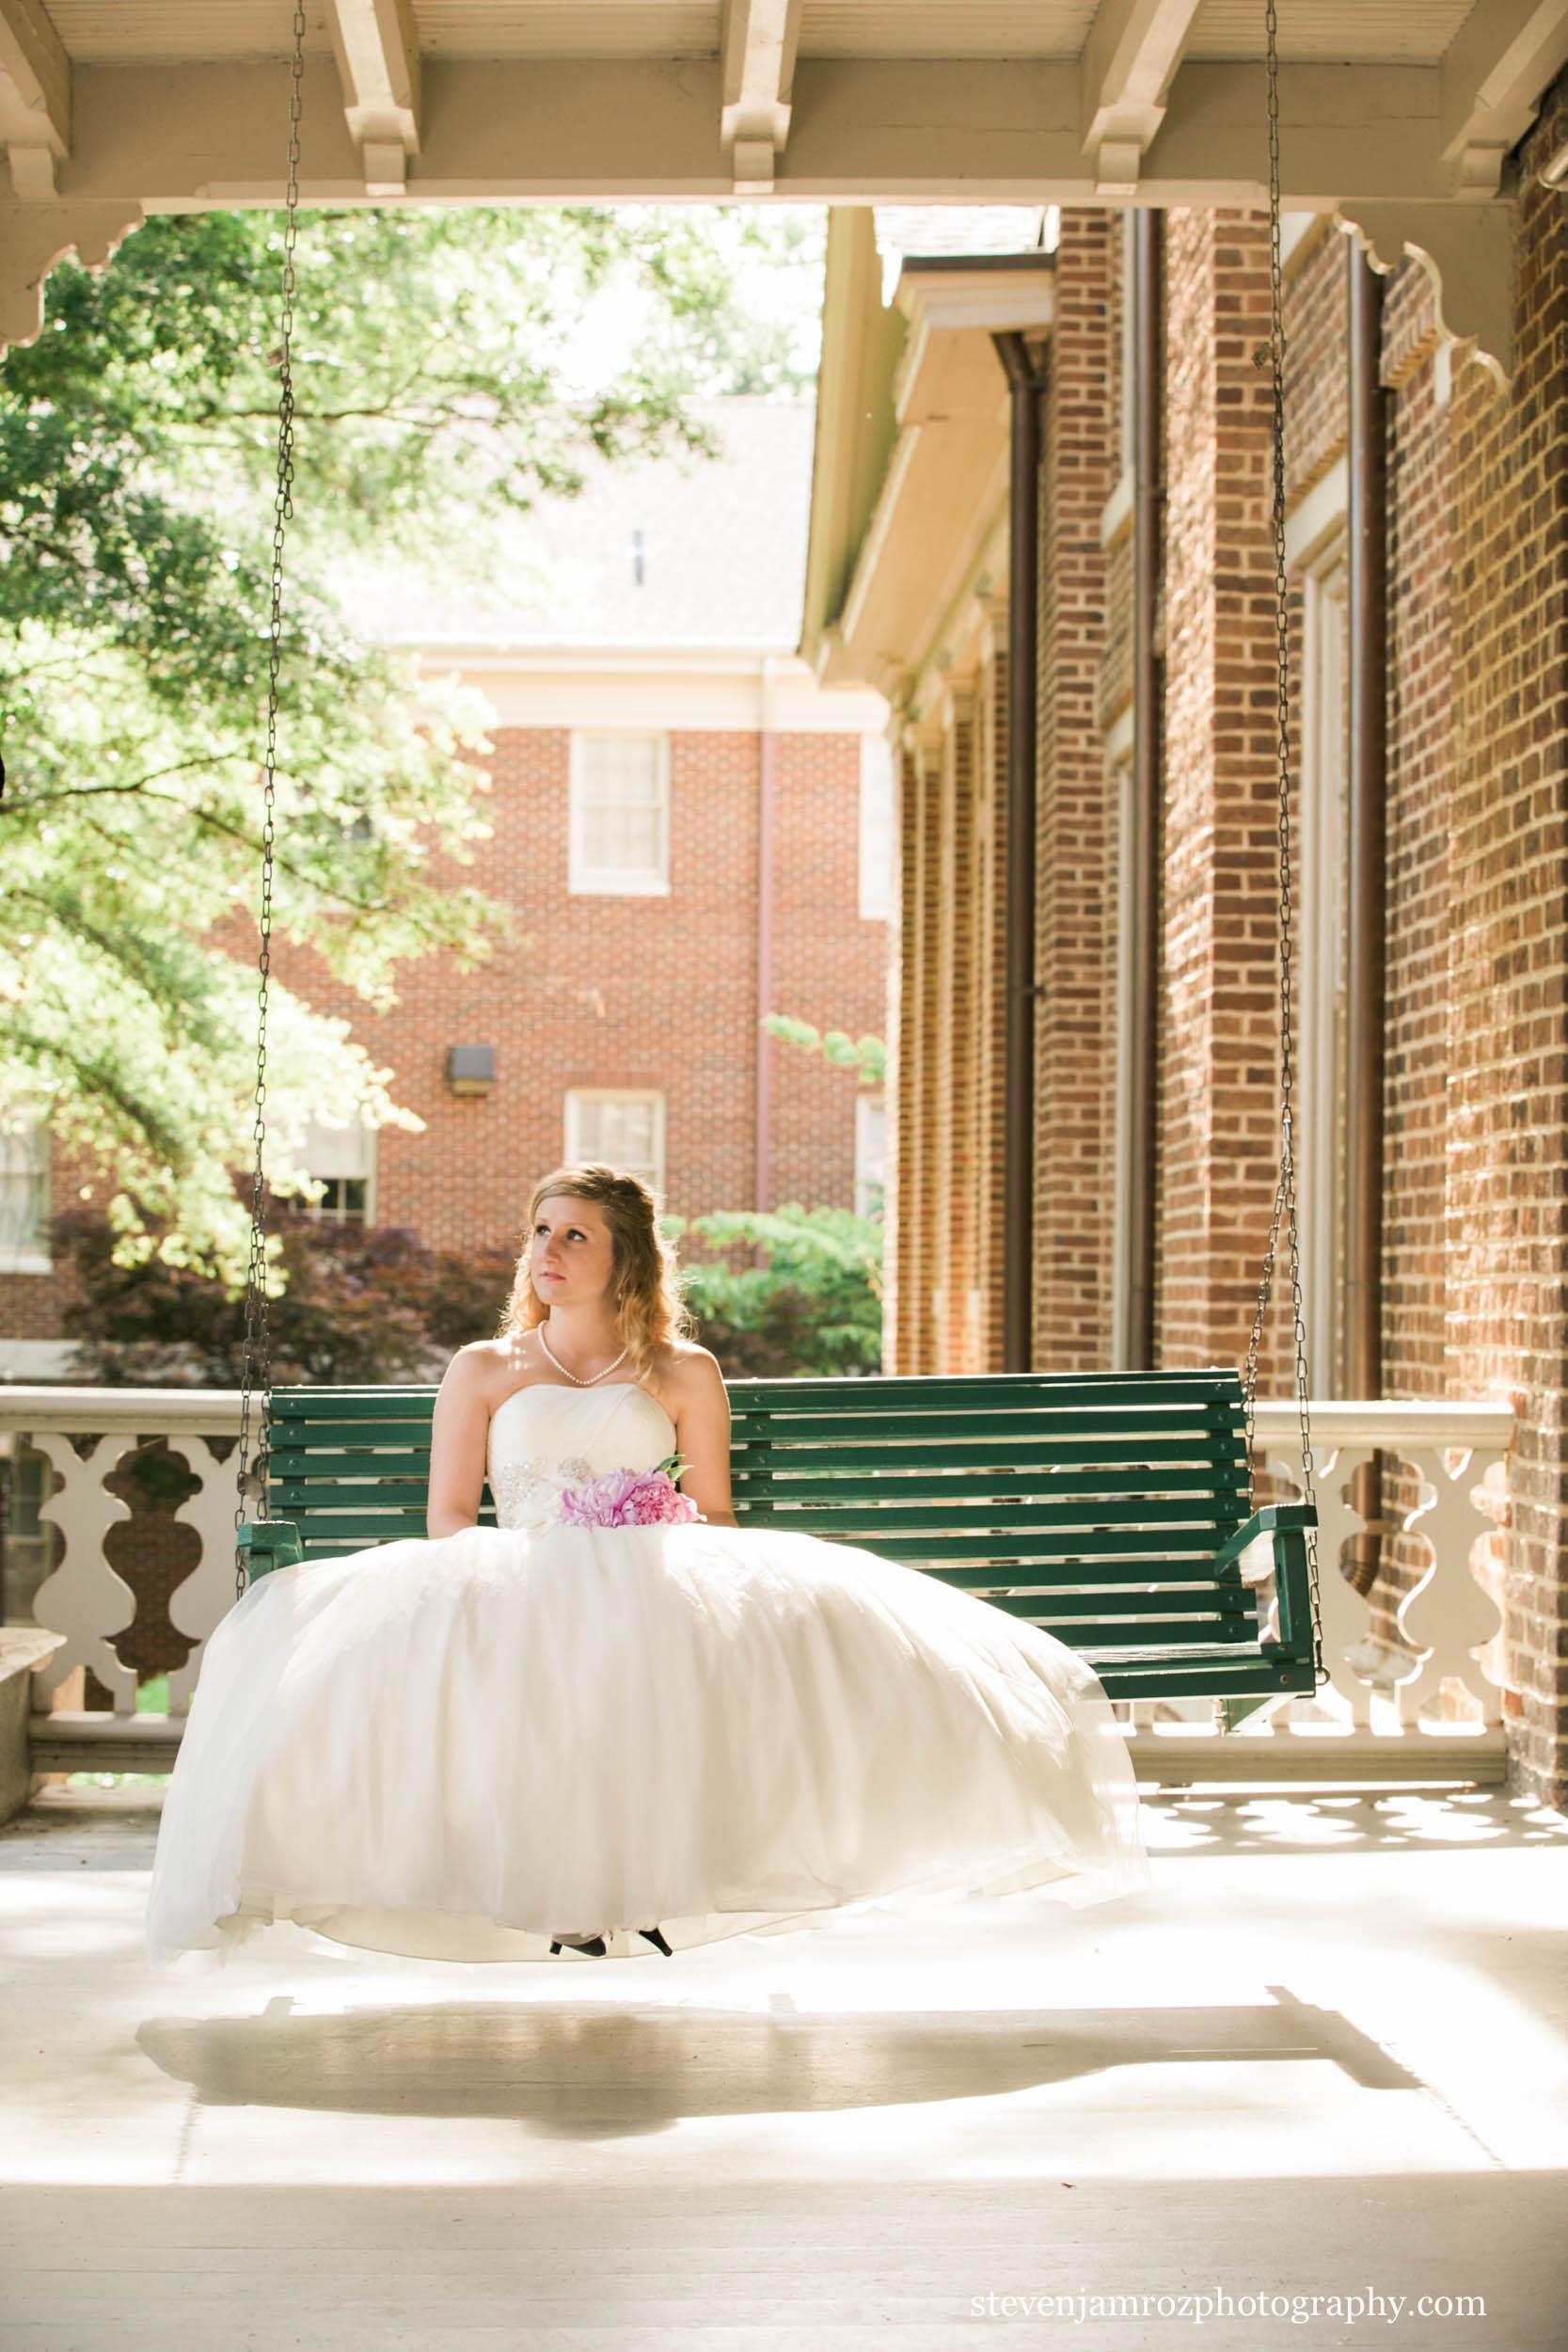 peace-college-front-swing-bride-steven-jamroz-photography-0501.jpg